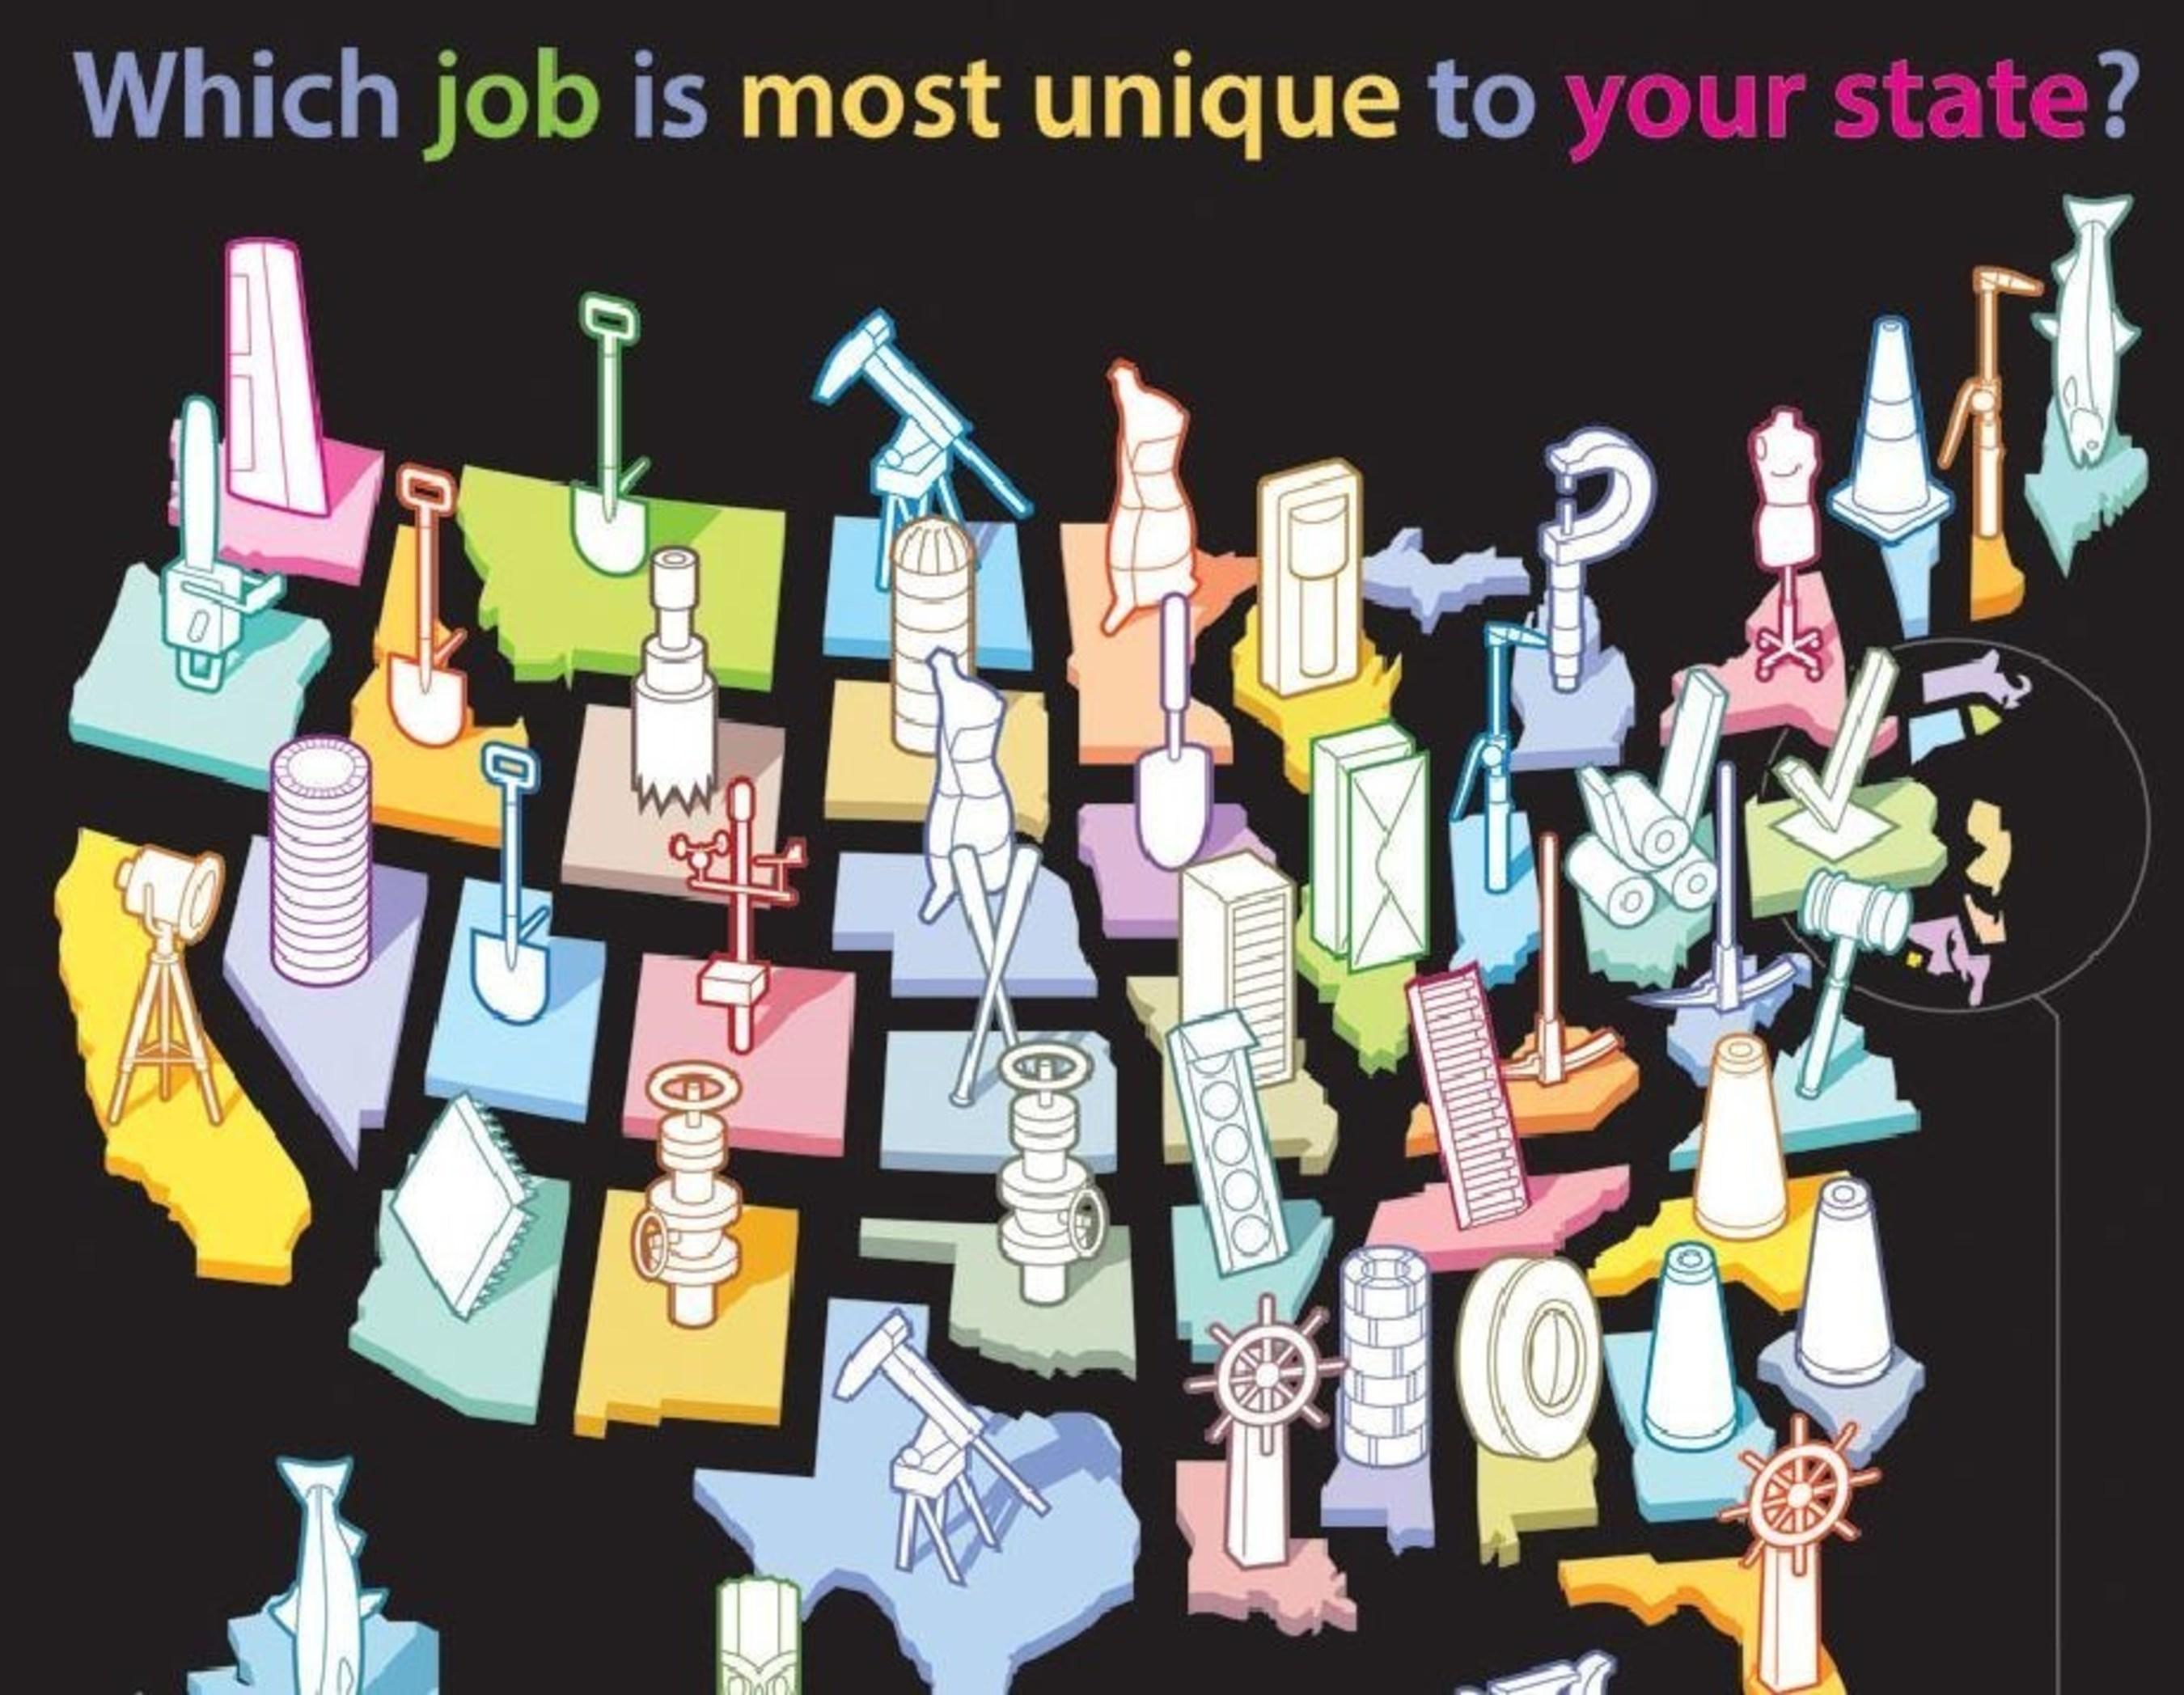 Infographic: www.mentalfloss.com/uniquejobs